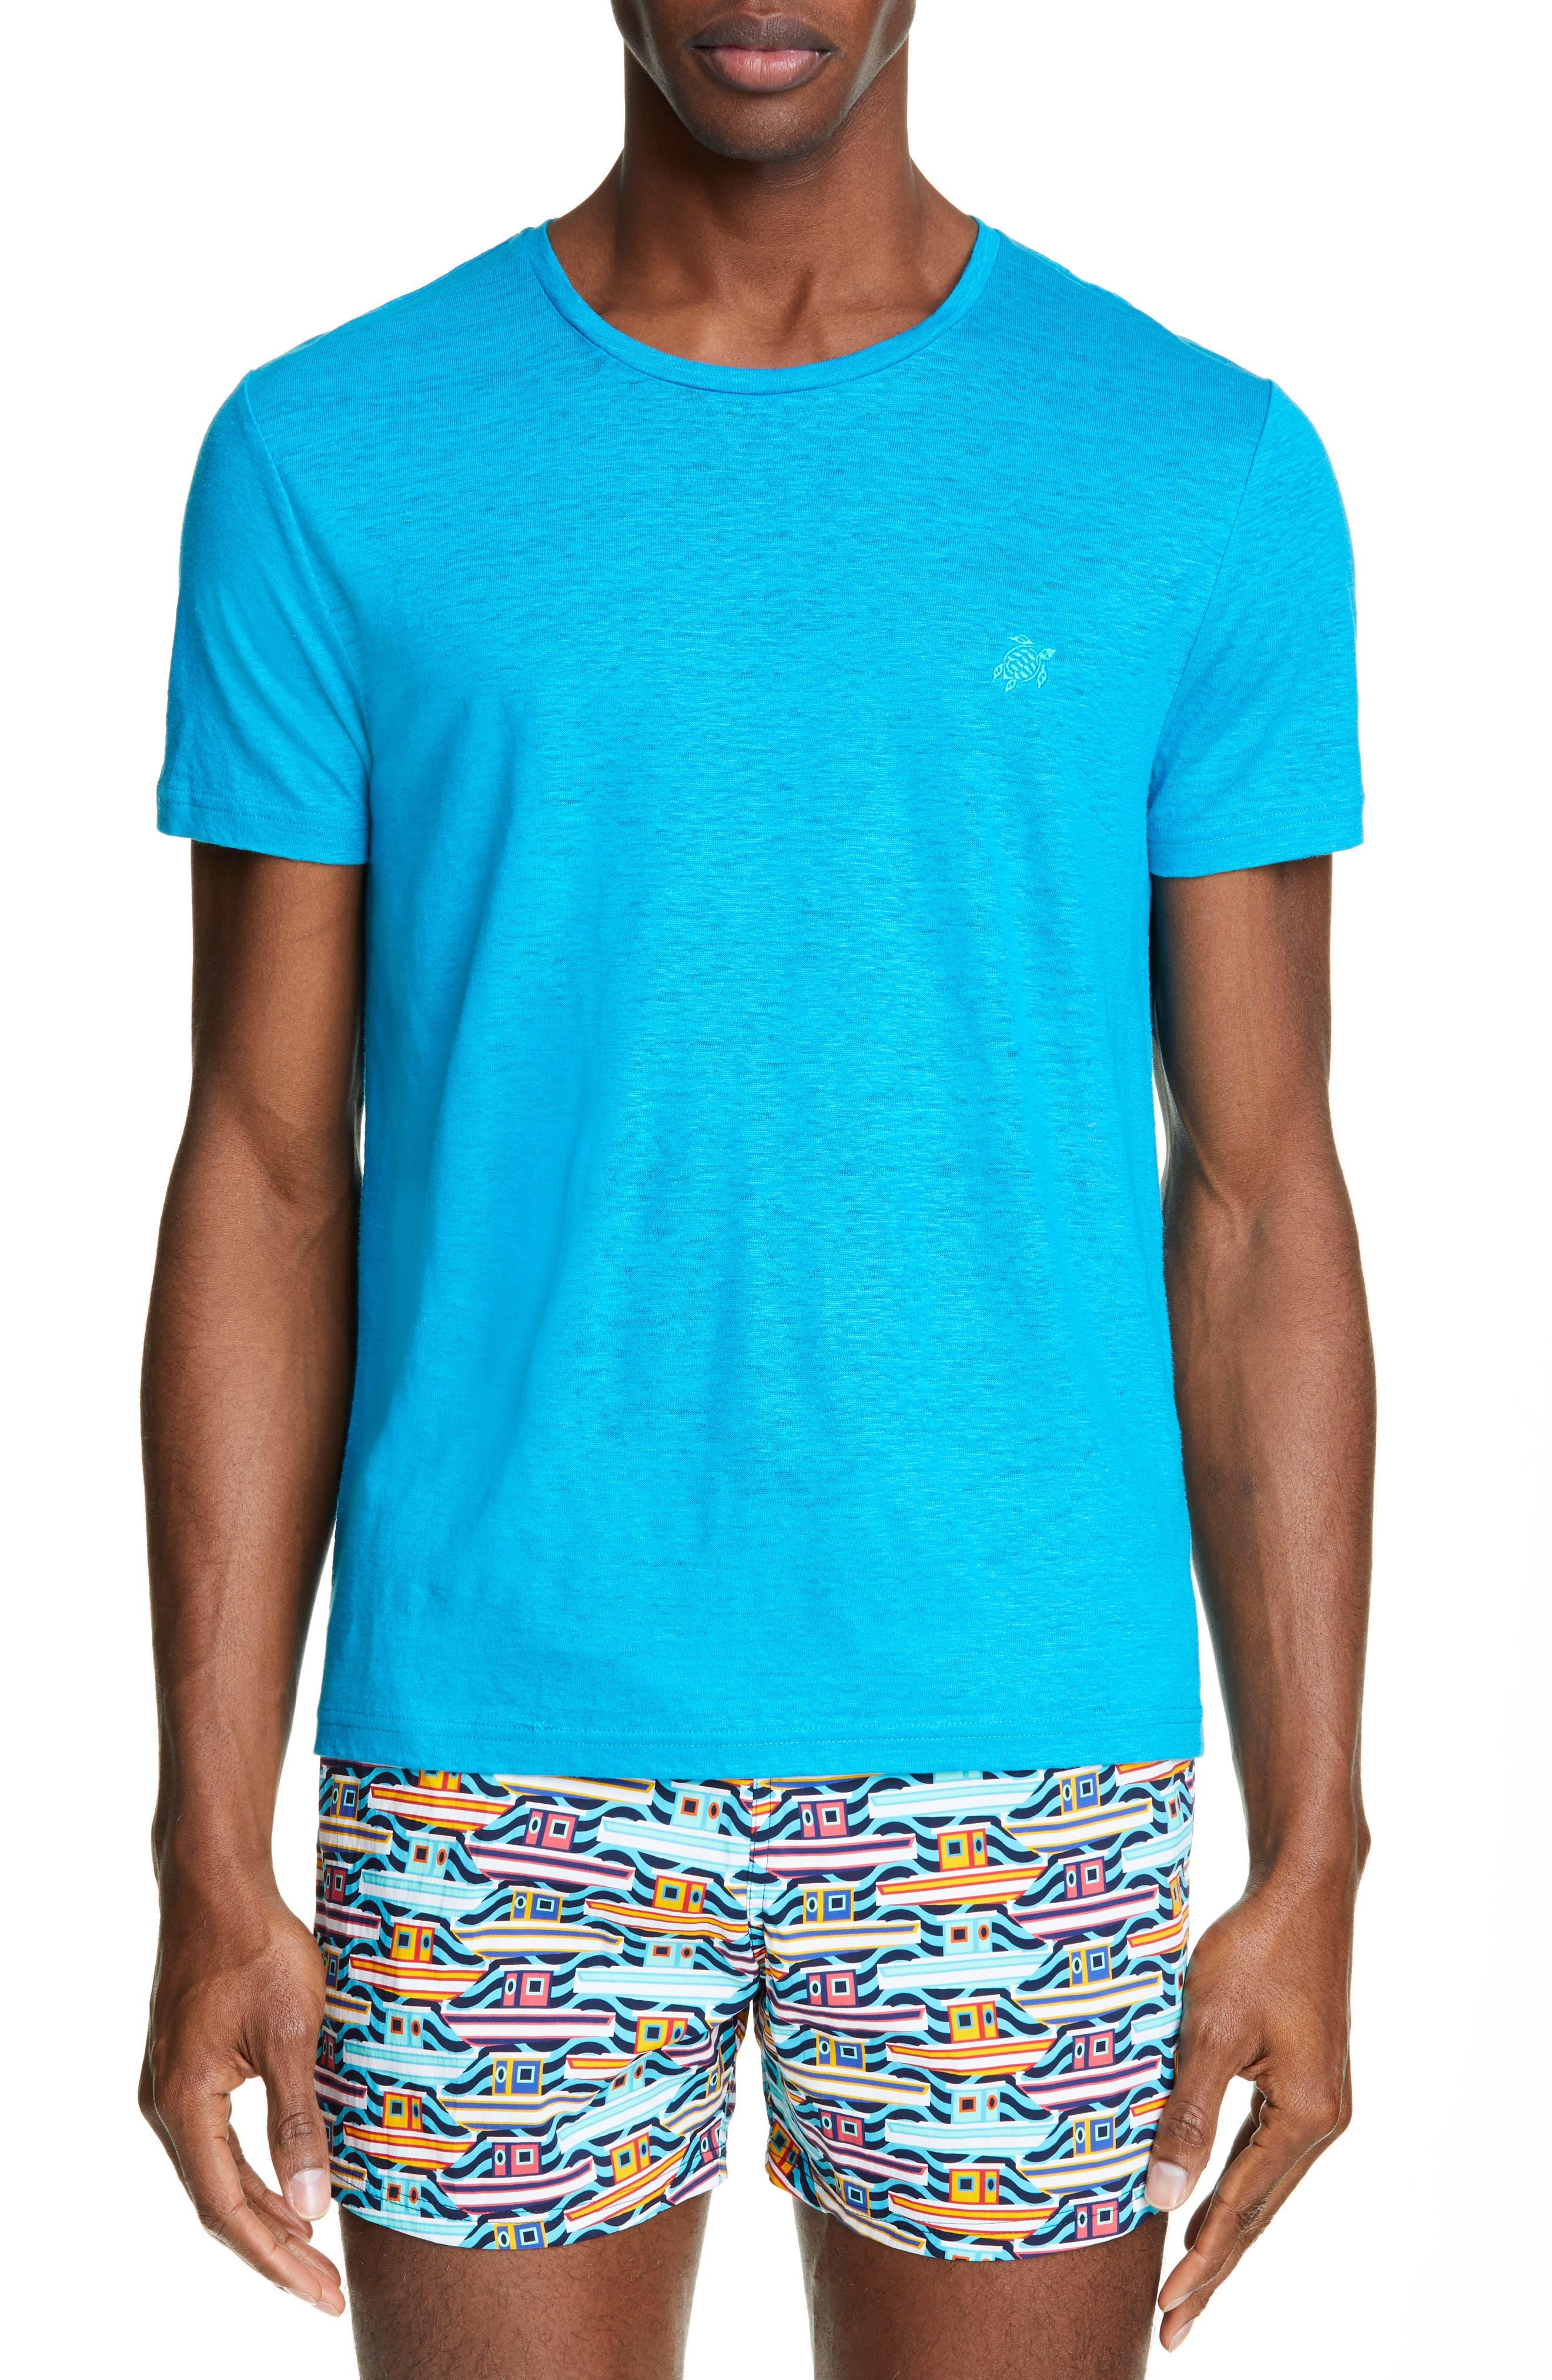 VILEBREQUIN, Linen Jersey T-Shirt, Main thumbnail 1, color, SEYCHELLES